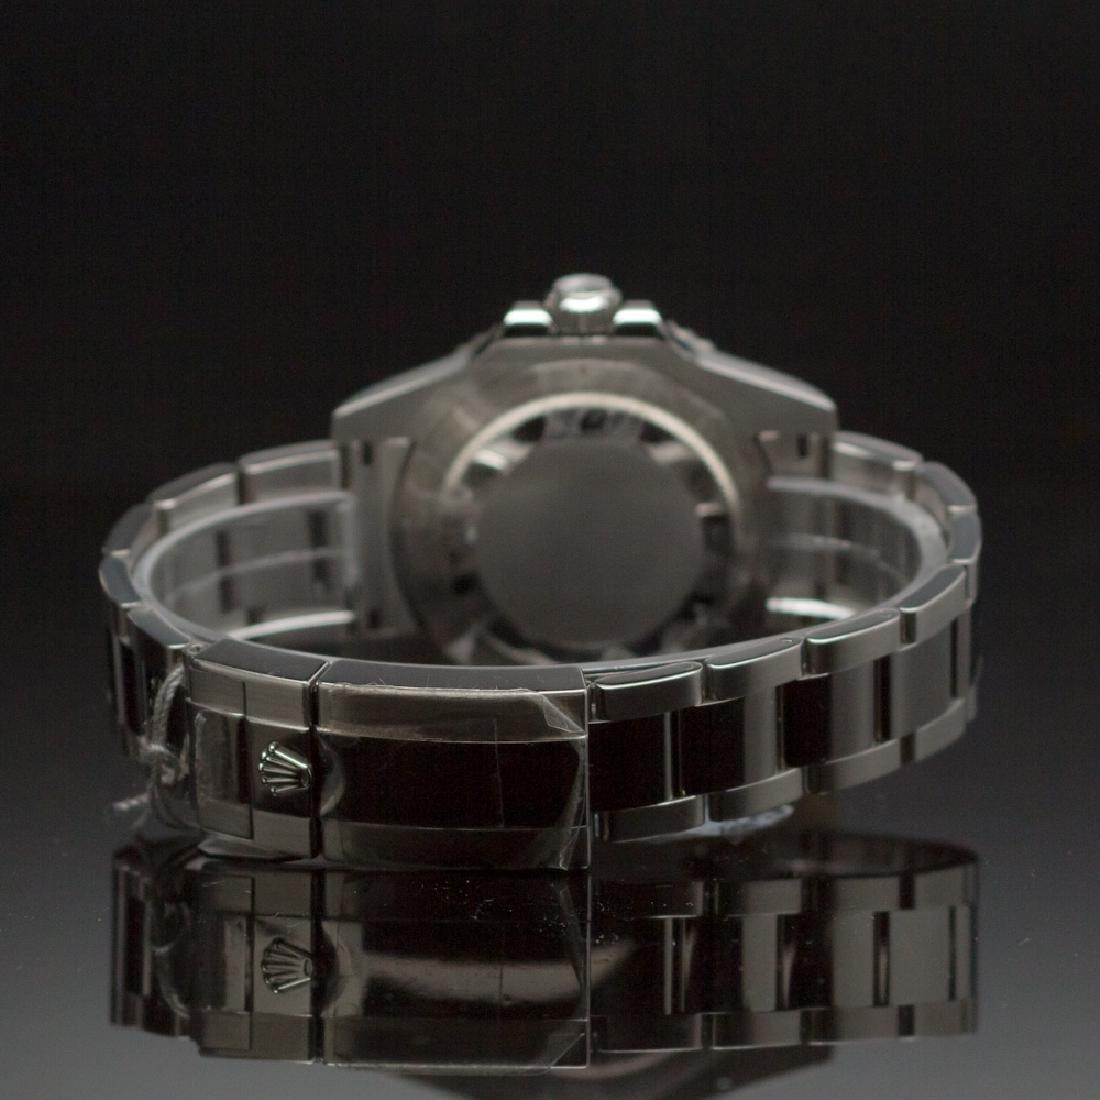 Rolex Stainless Steel 40mm GMT Master II Ceramic Bezel - 3